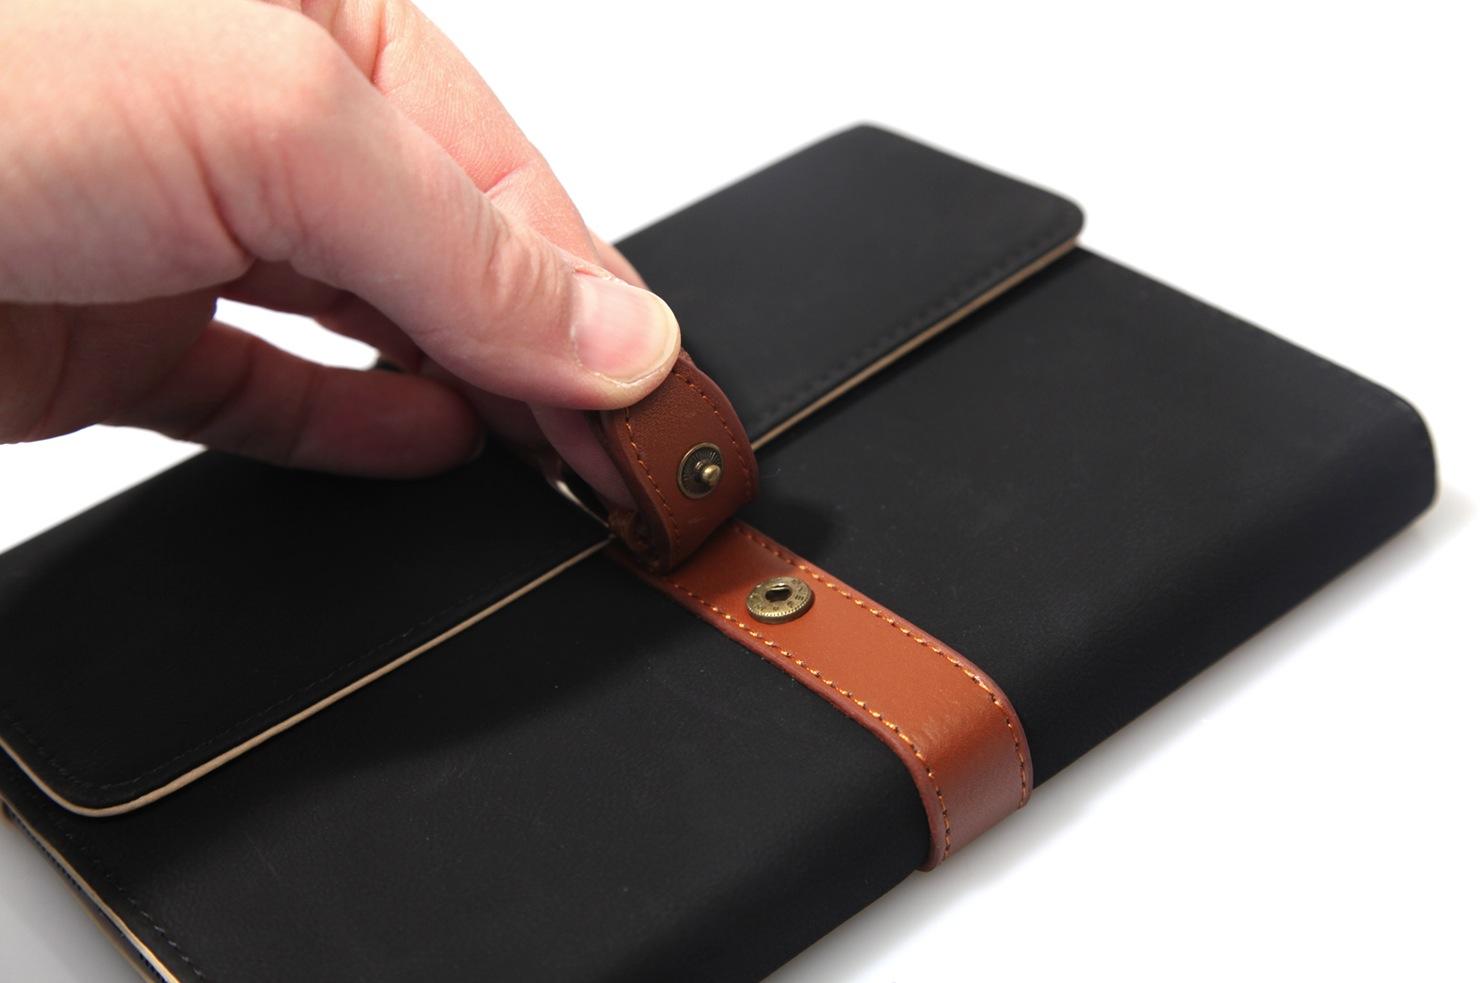 mobiletto oldschool ipad mini ledertaschen. Black Bedroom Furniture Sets. Home Design Ideas